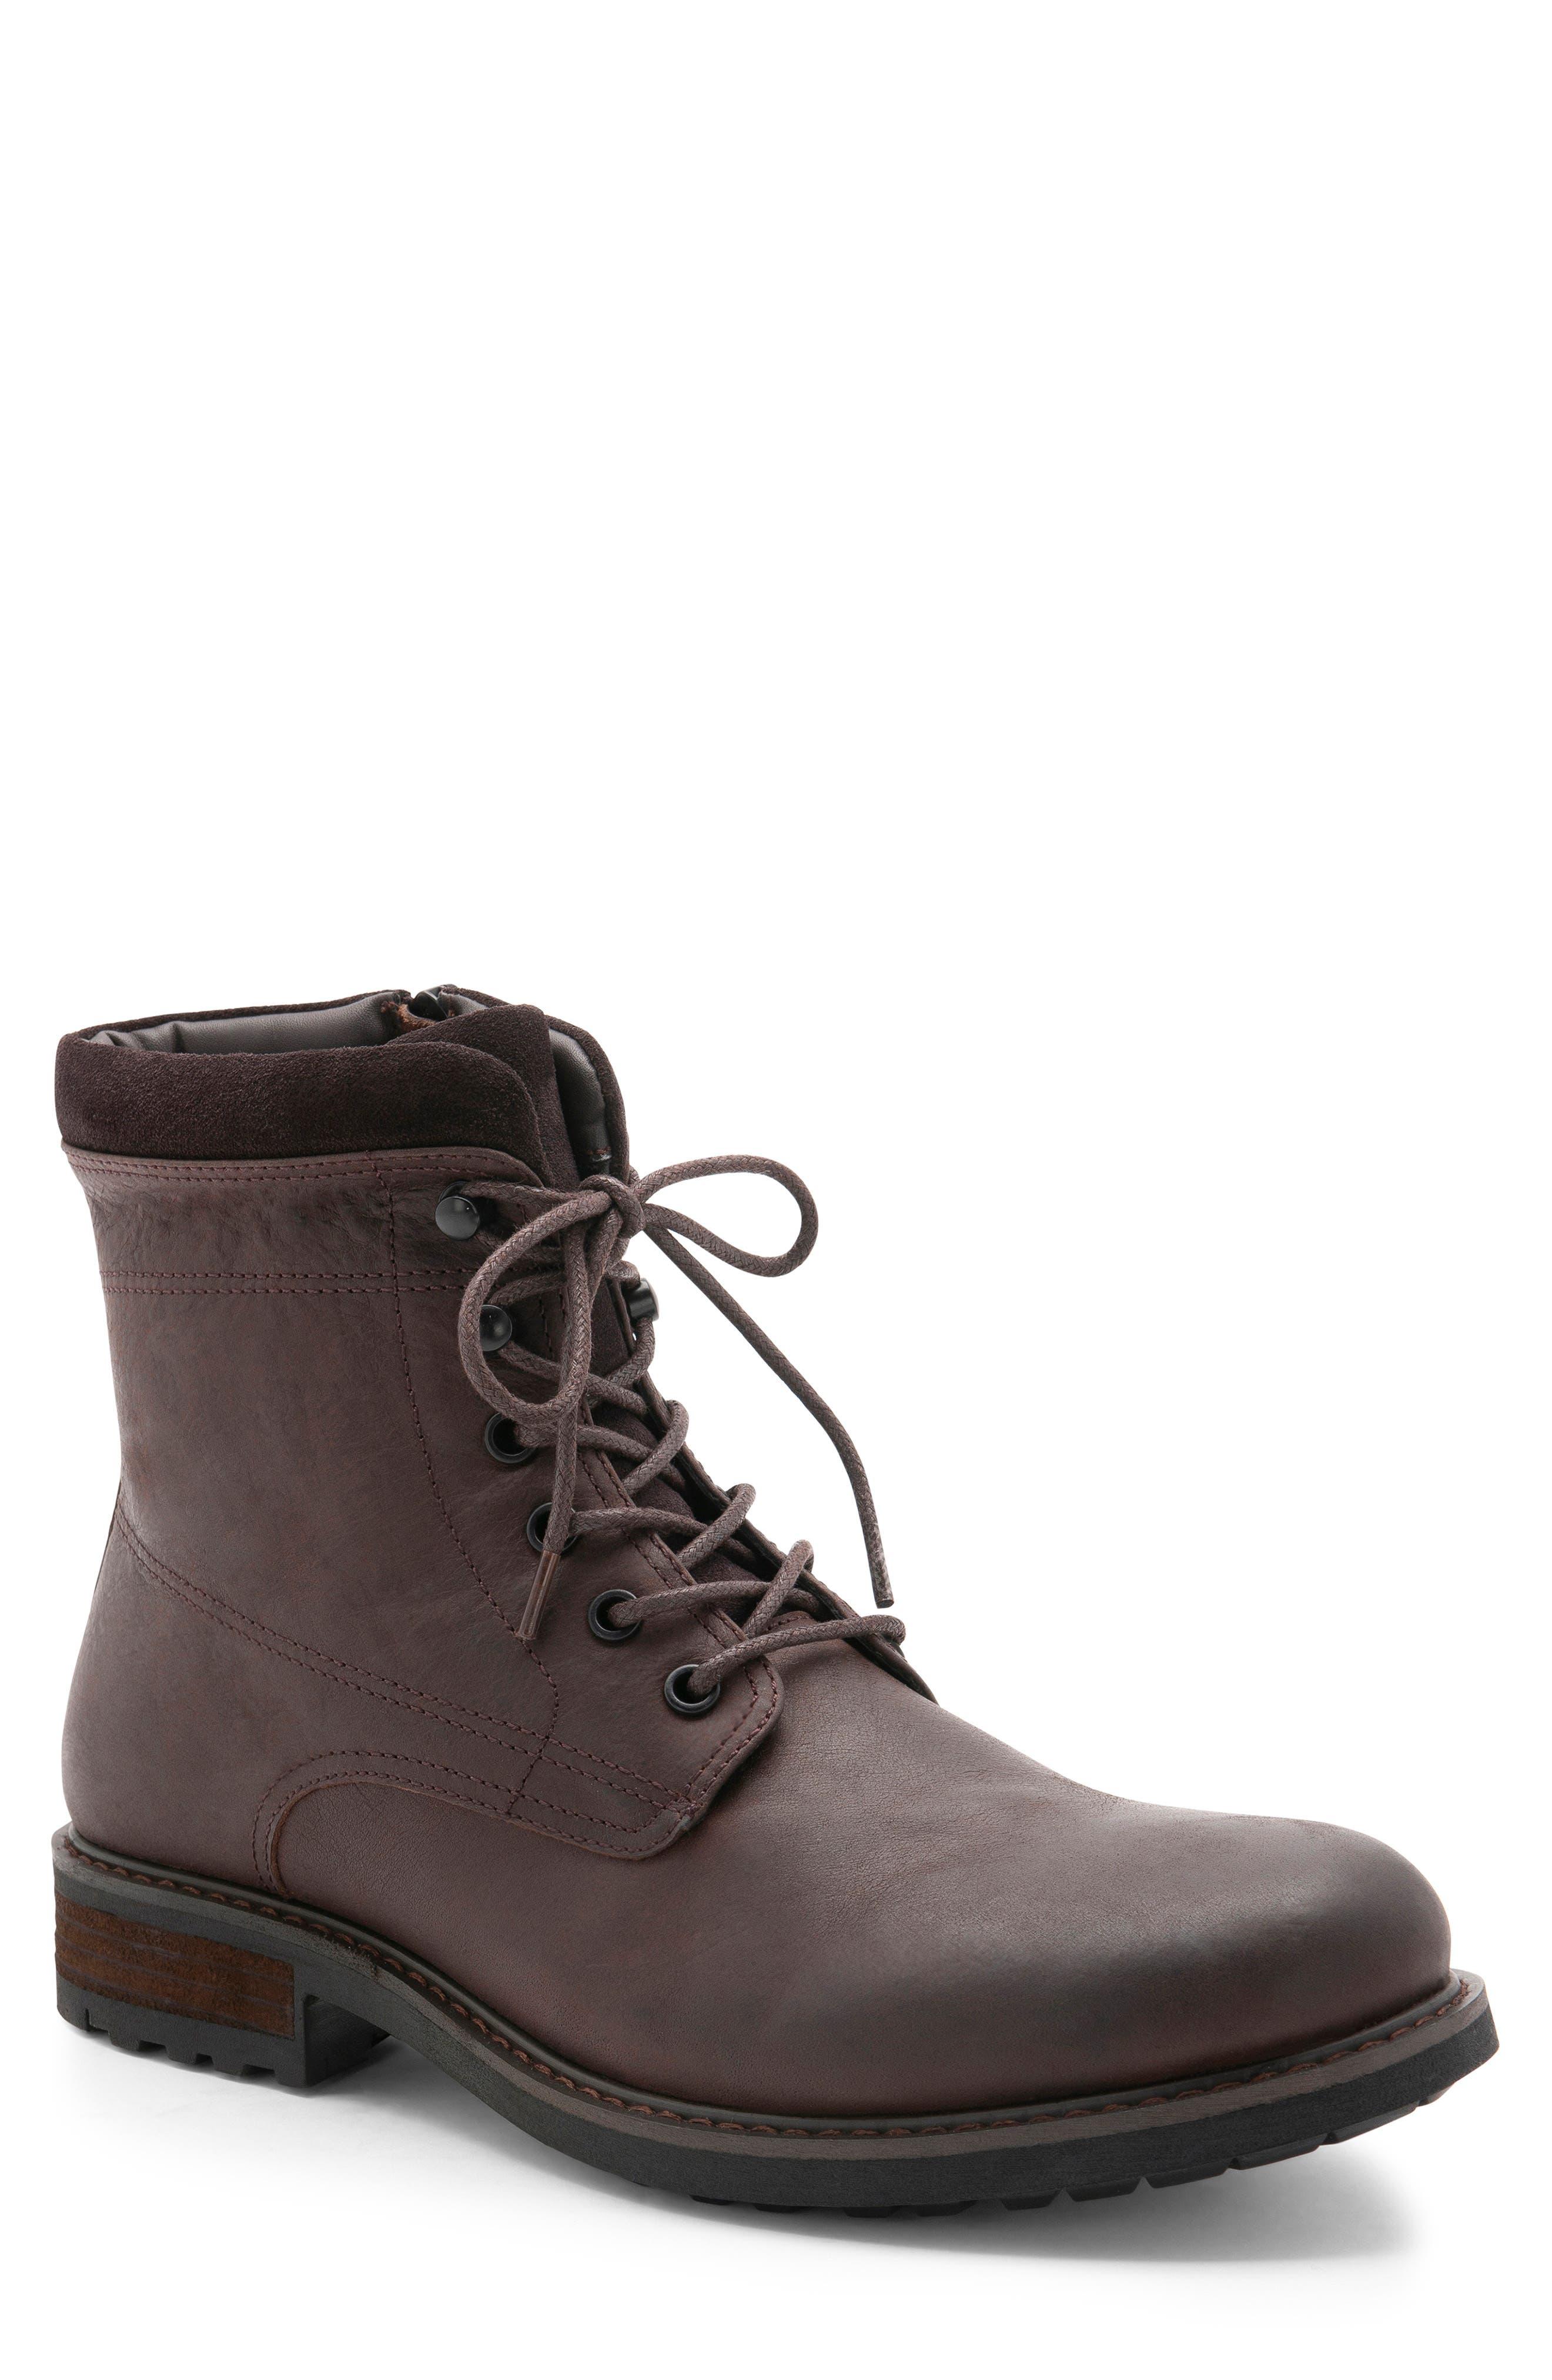 Blondo Patton Waterproof Plain Toe Boot, Brown